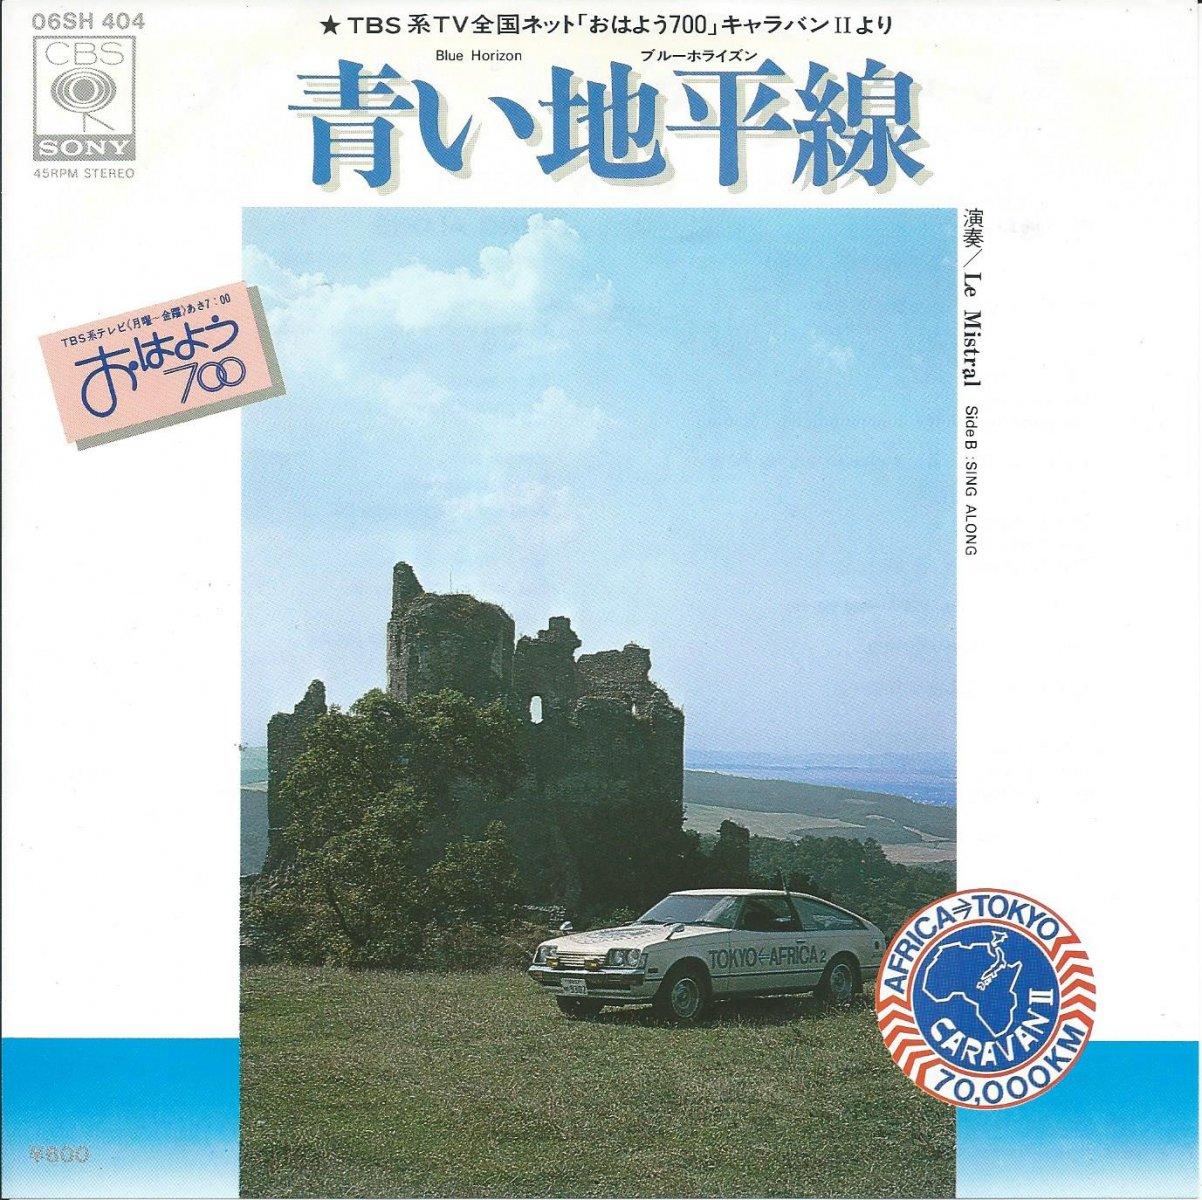 LE MISTRAL / 青い地平線 ブルー・ホライズン BLUE HORIZON / SING ALONG (7